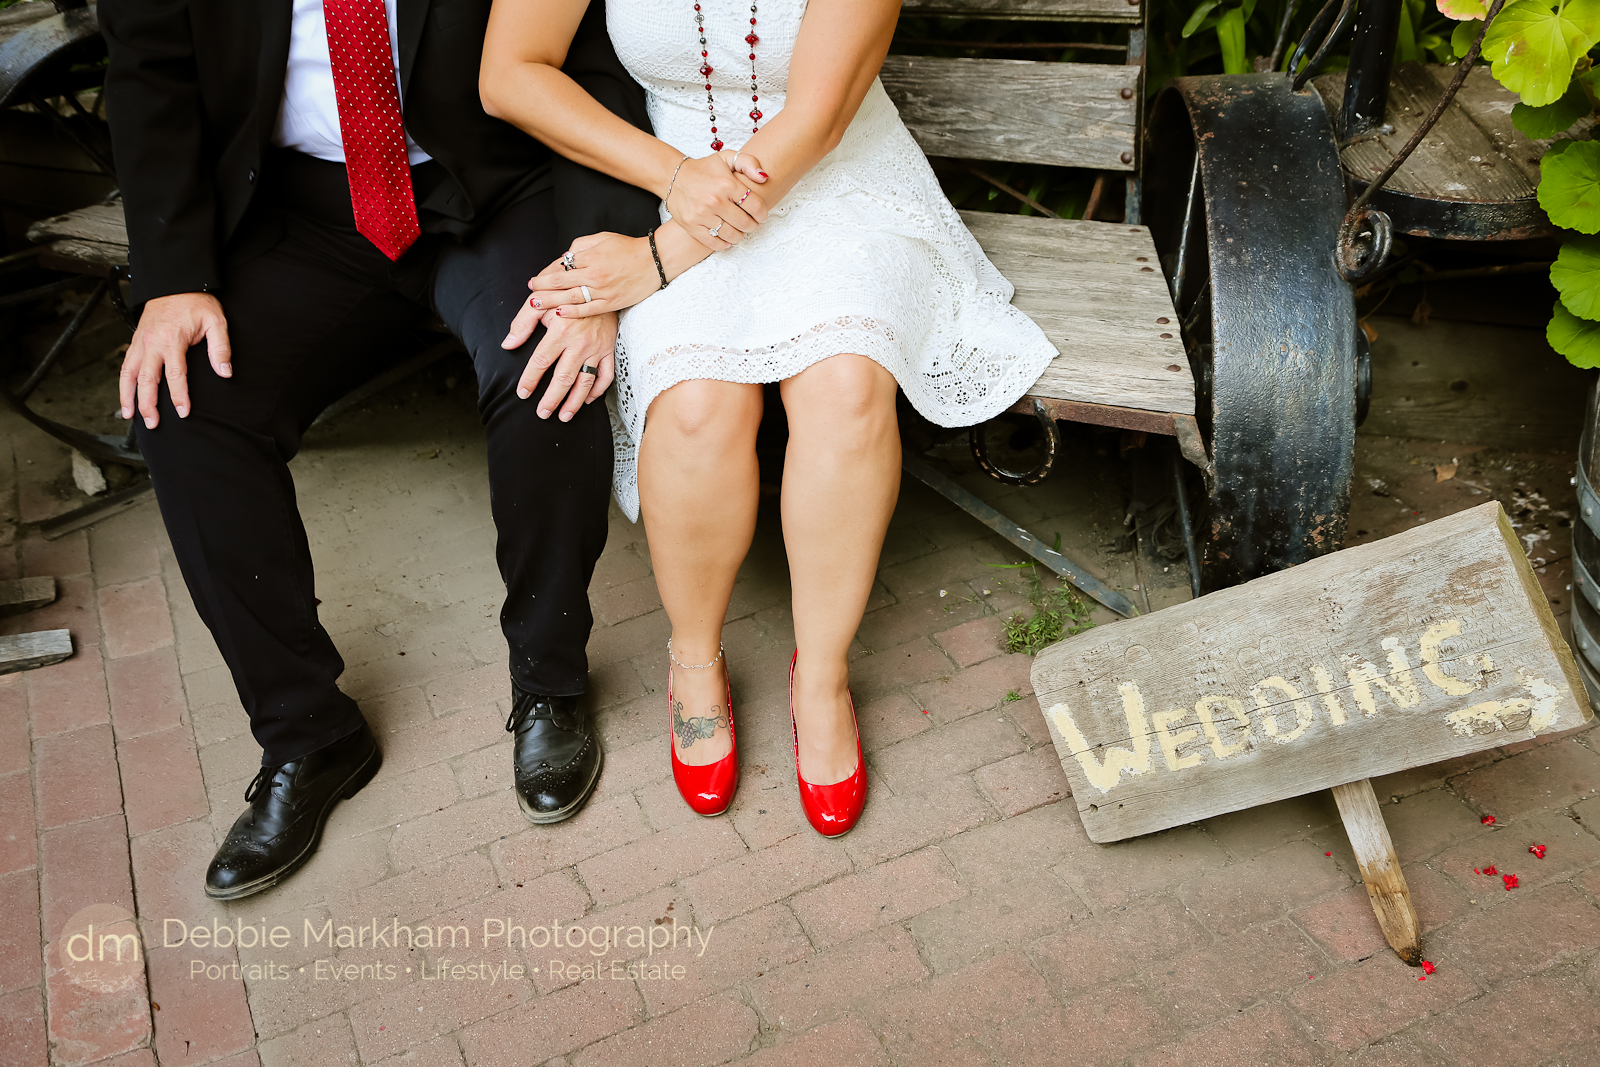 Debbie-Markham-Photography_Small-Town-Wedding_Destination-Wedding_California_Central-Coast-2083.jpg